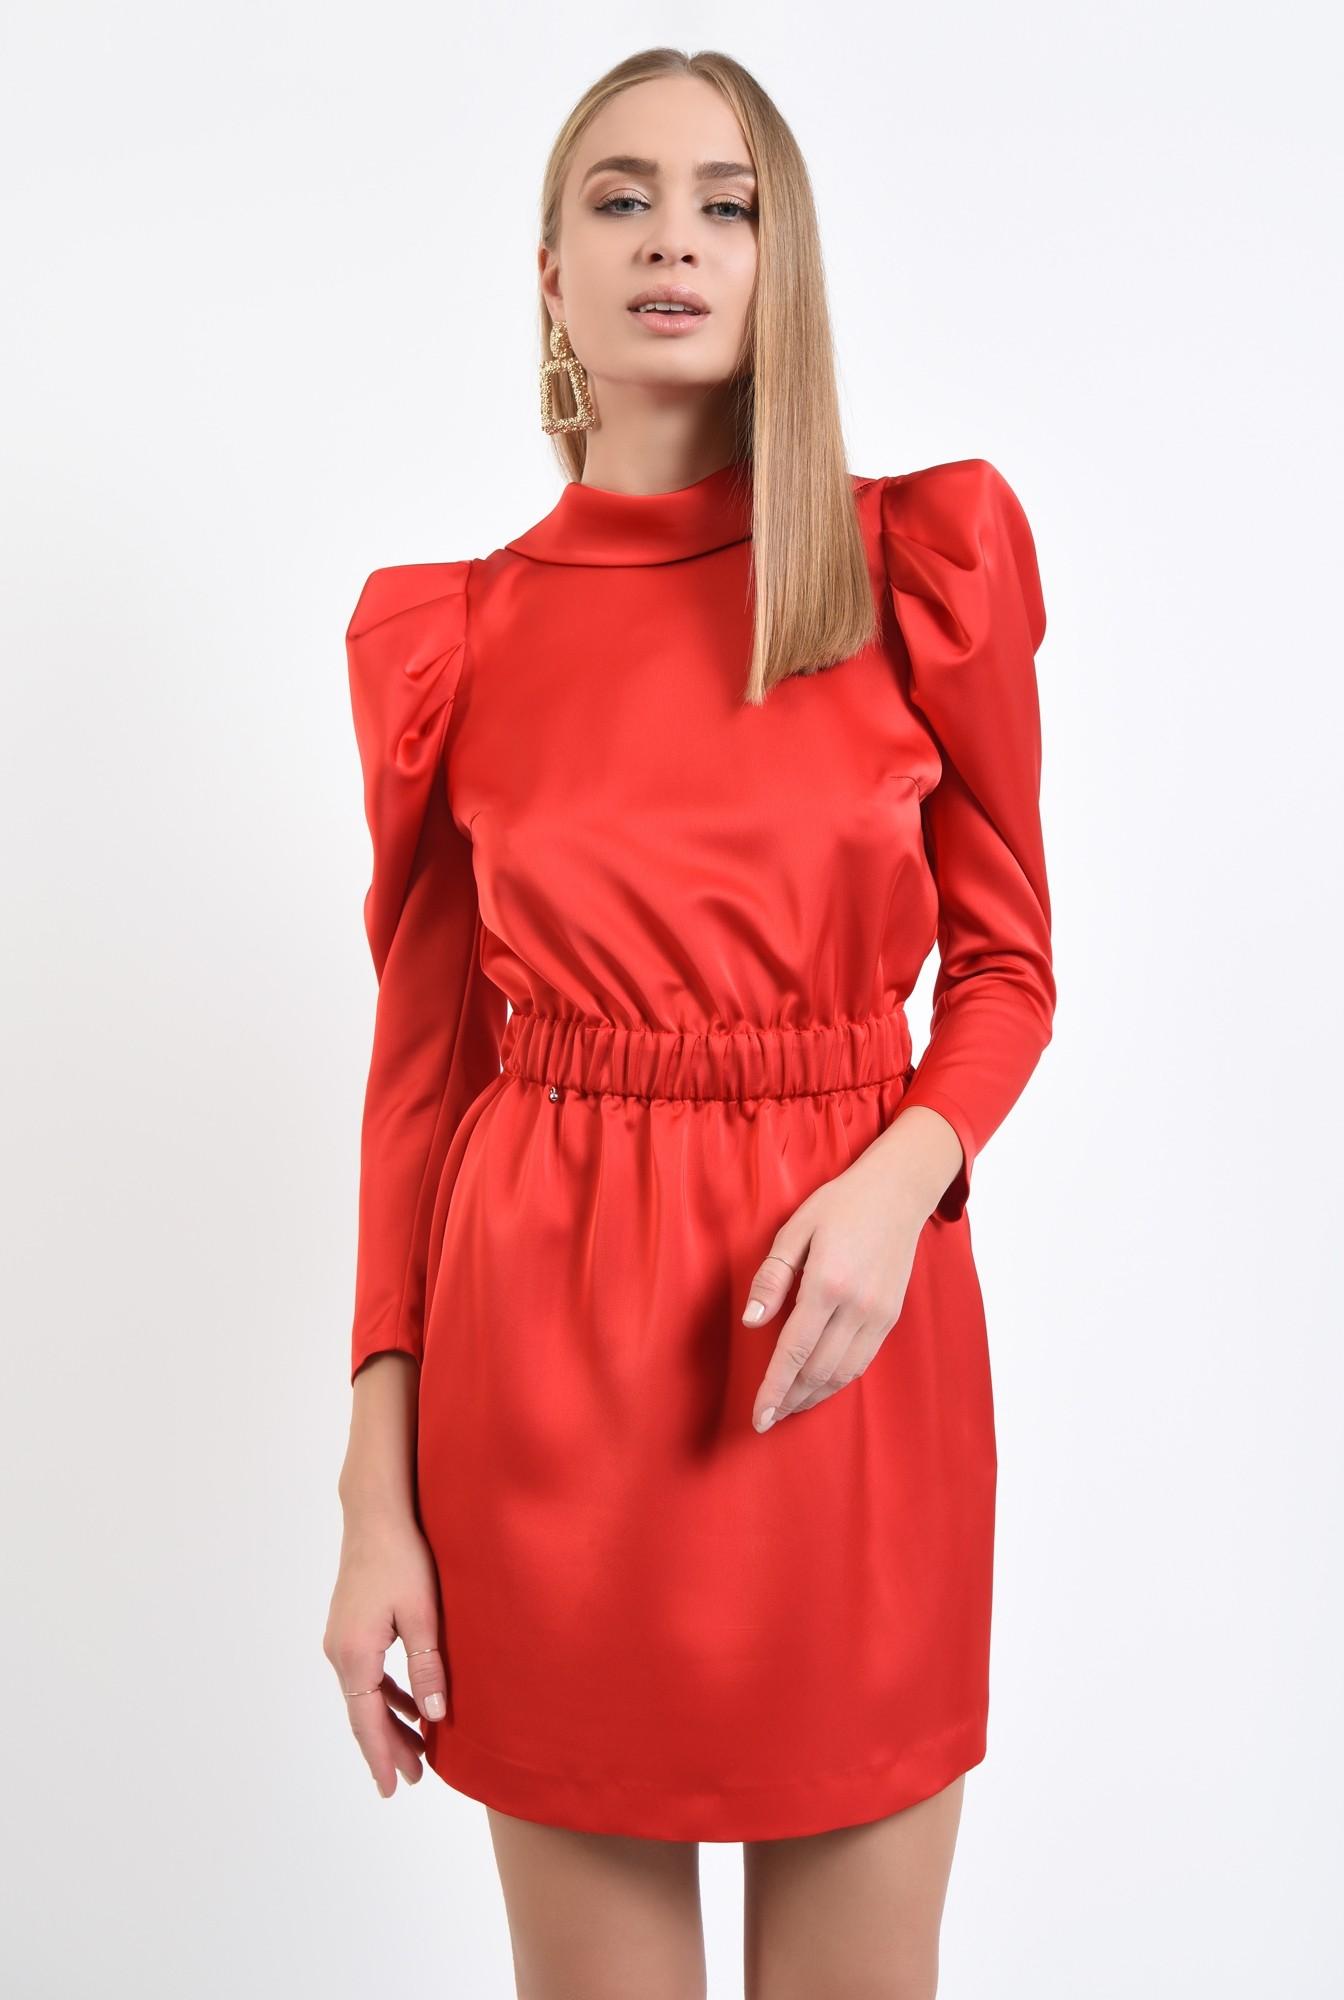 0 - 360 - rochie eleganta, mini, maneci cu cret la umar, spate gol